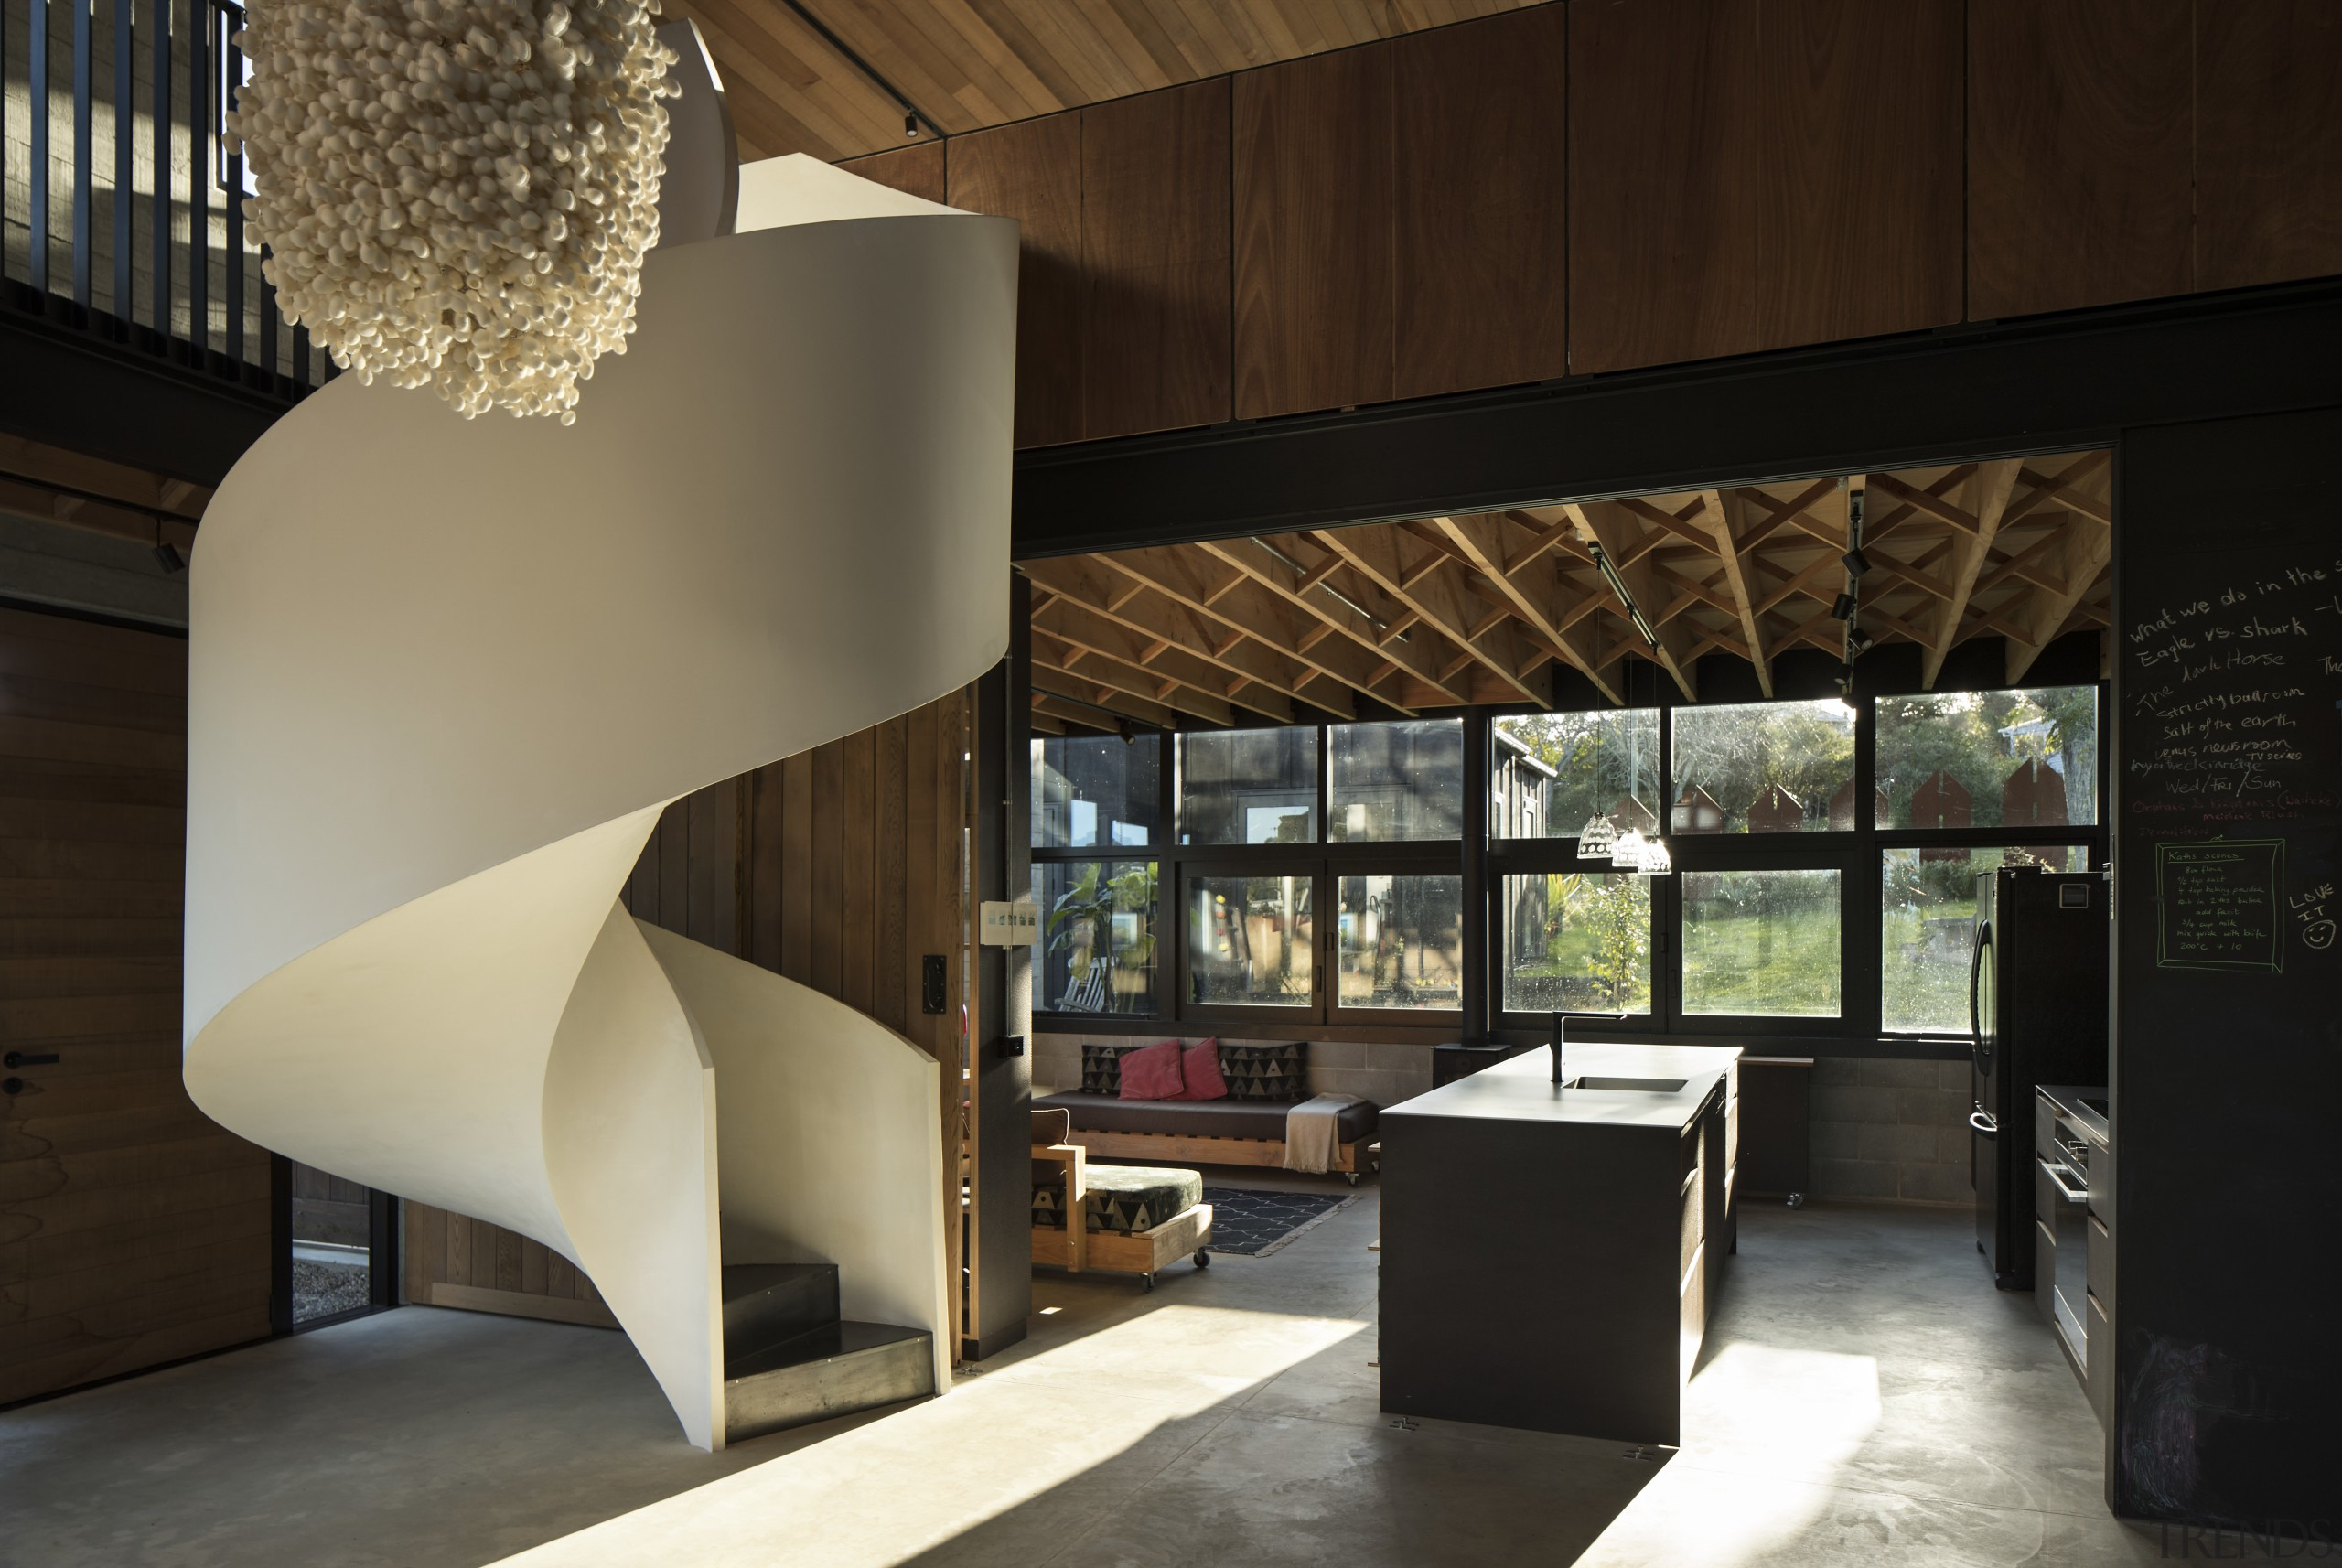 Floor joists for the mezzanine floor above are architecture, furniture, interior design, lobby,